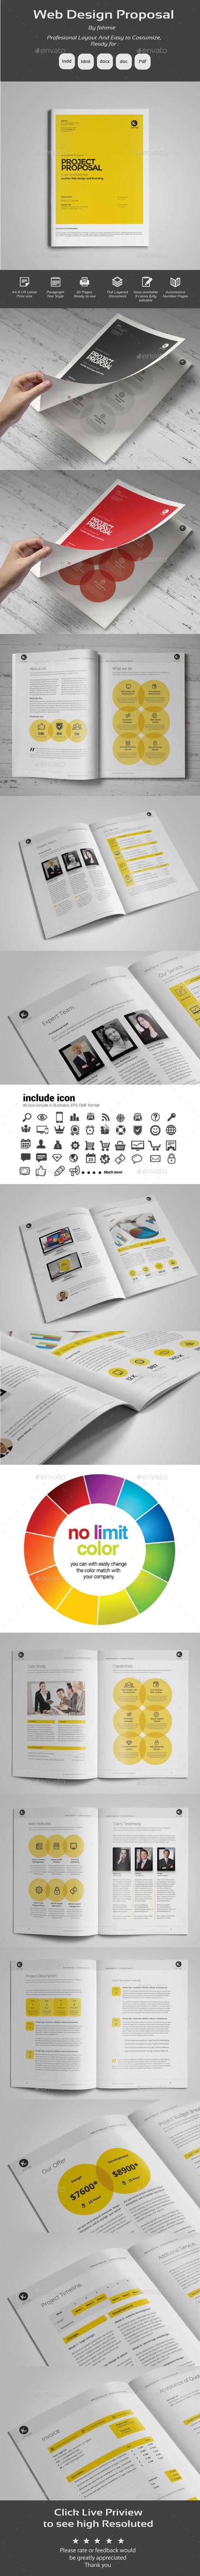 Web Design Proposal Template #design #print Download: http://graphicriver.net/item/web-design-proposal/11974529?ref=ksioks